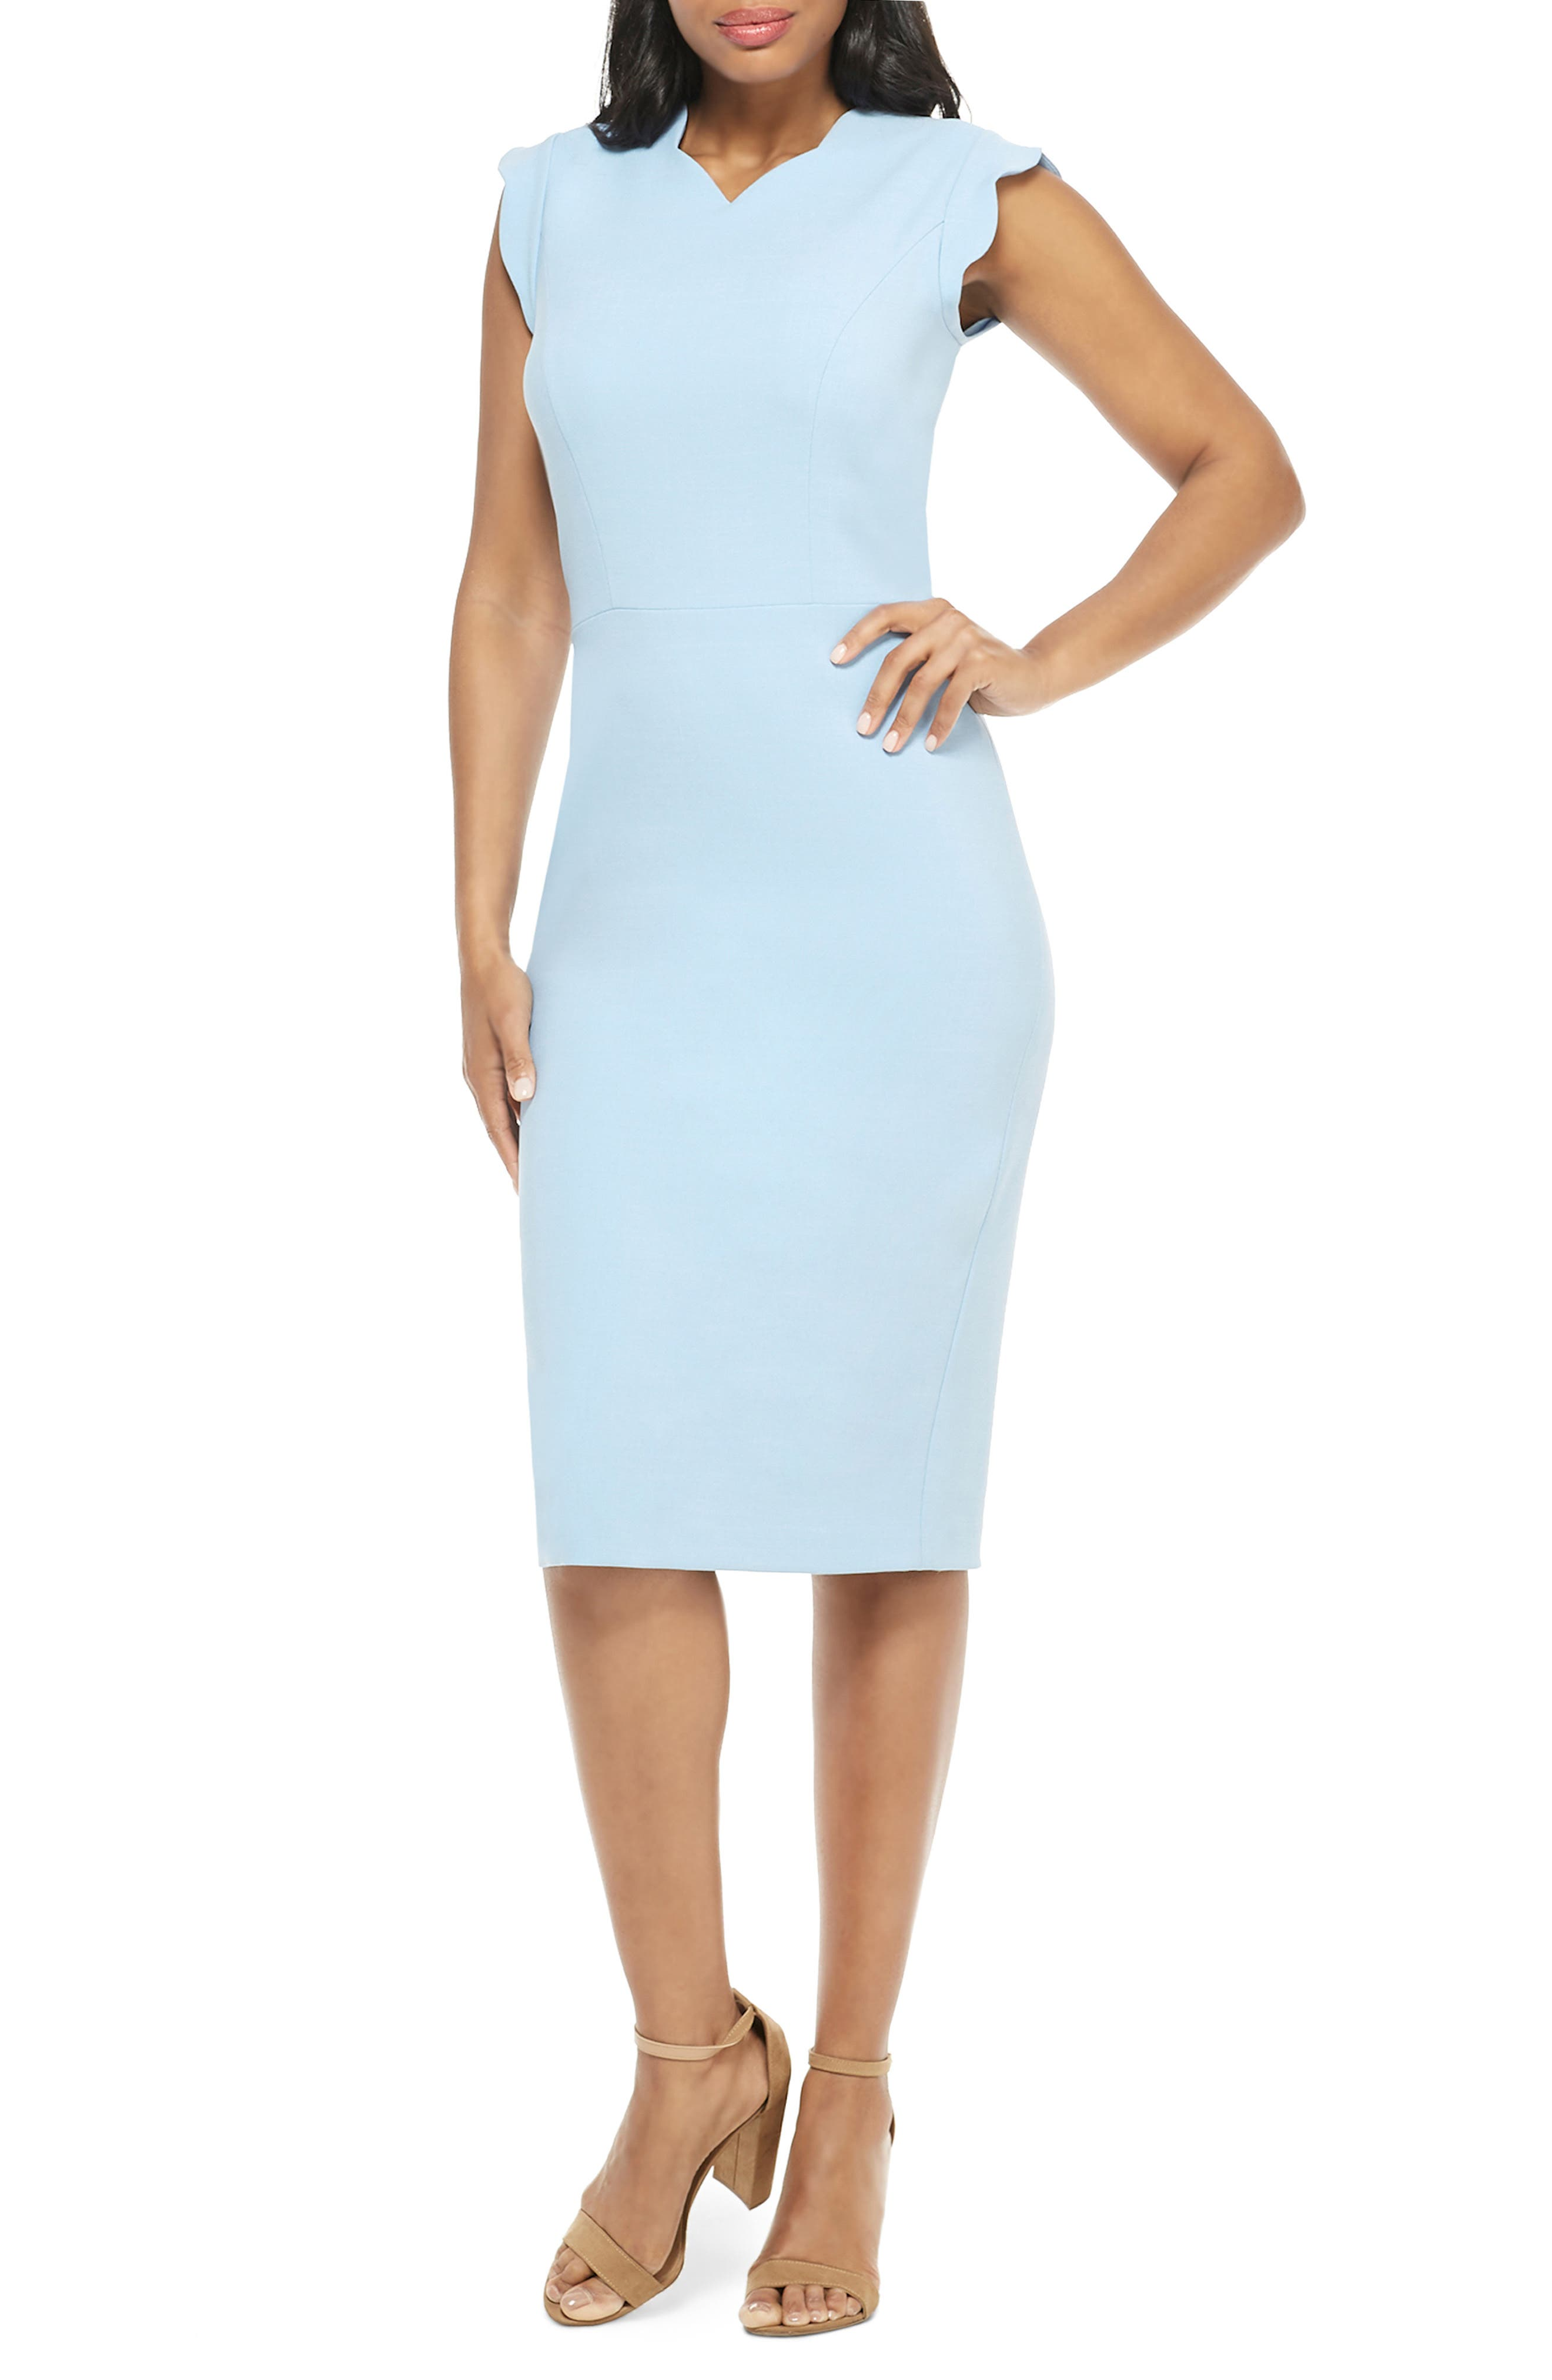 Maggy London Lucy Scallop Cap Sleeve Sheath Dress, Blue